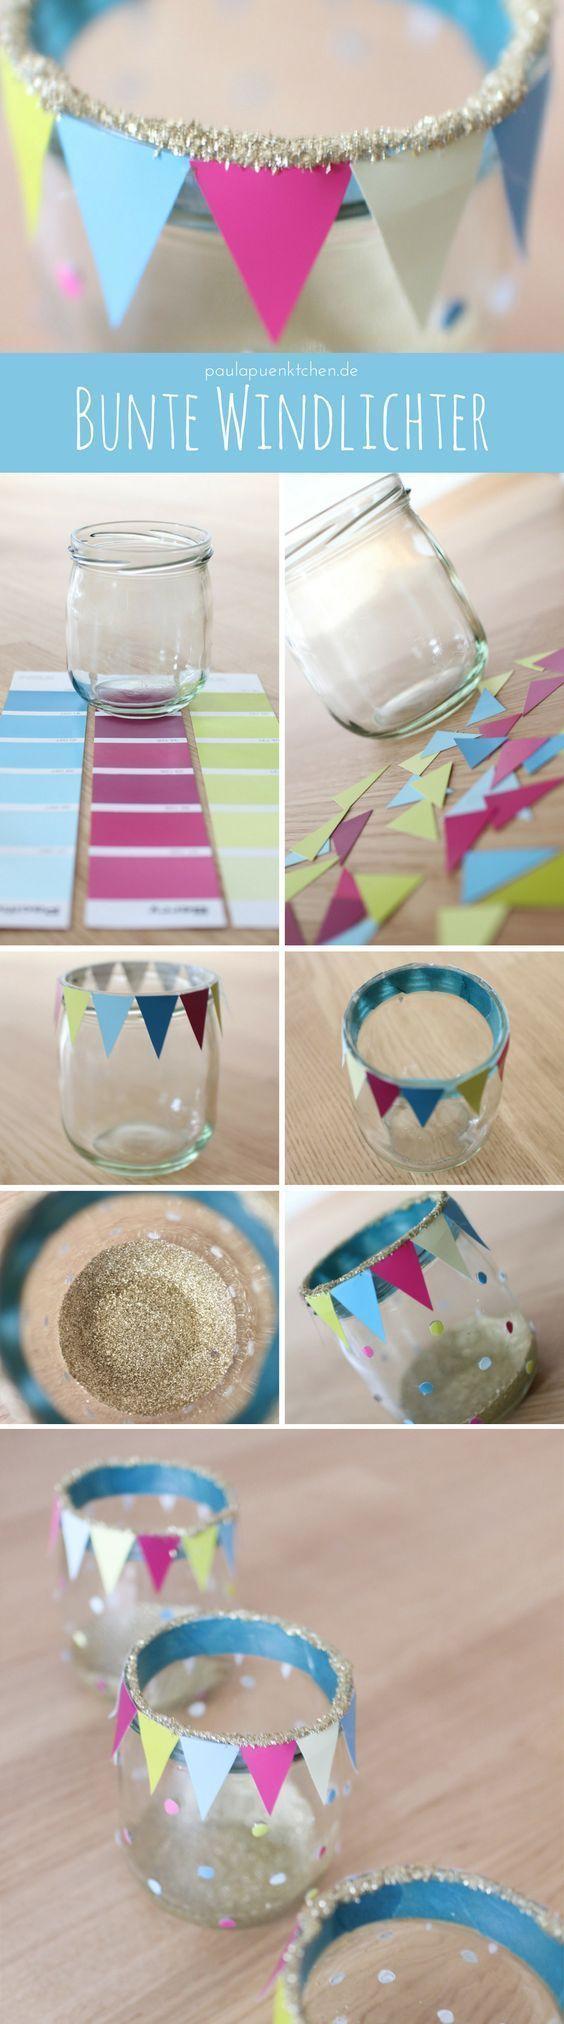 DIY Tischdekoration: Bunte Laternen basteln - Paula Dots